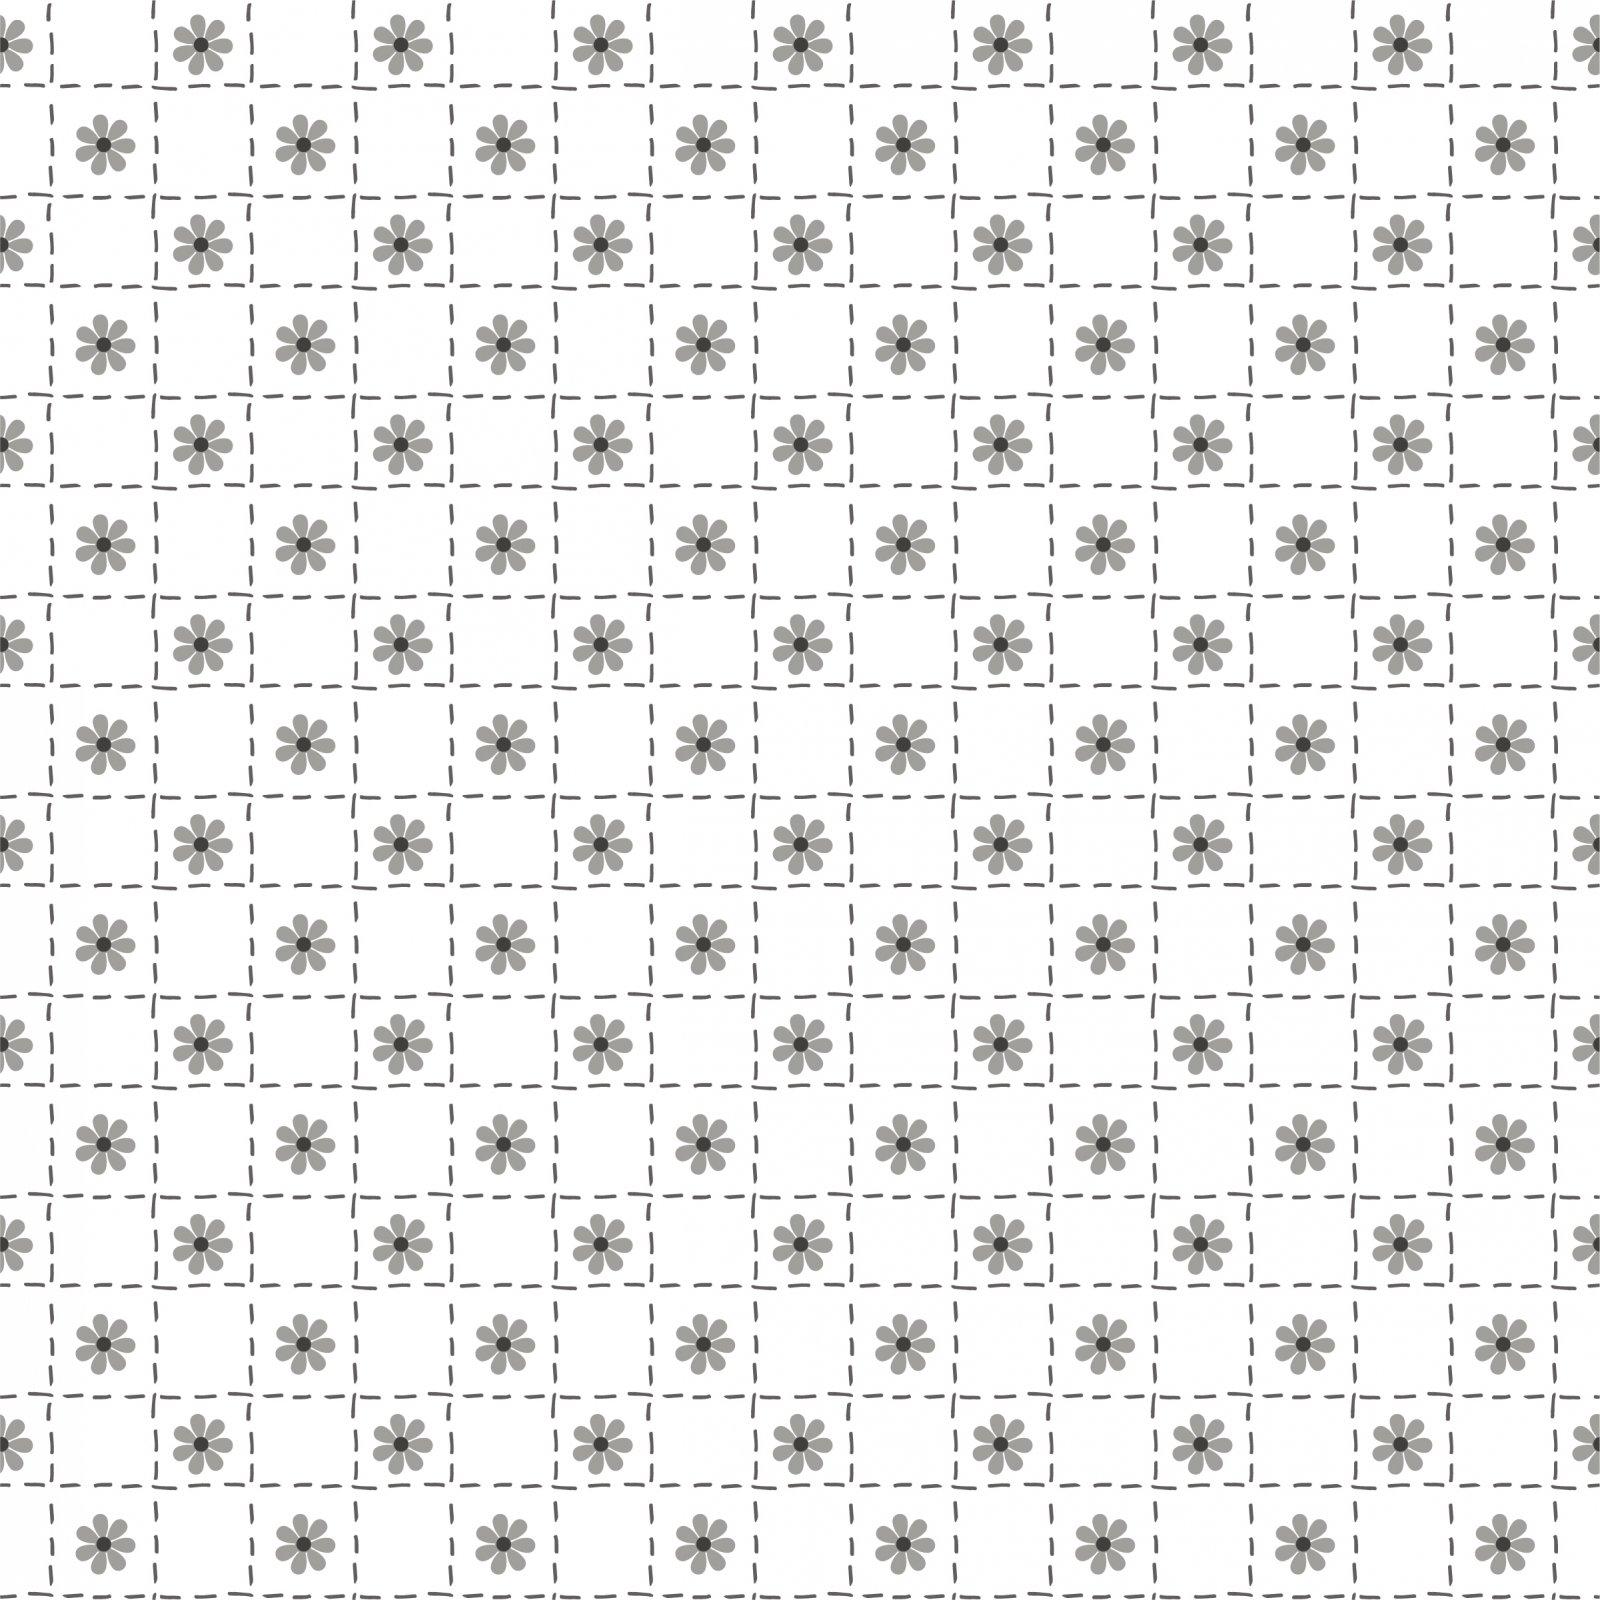 Shades of Grey 18504-WH